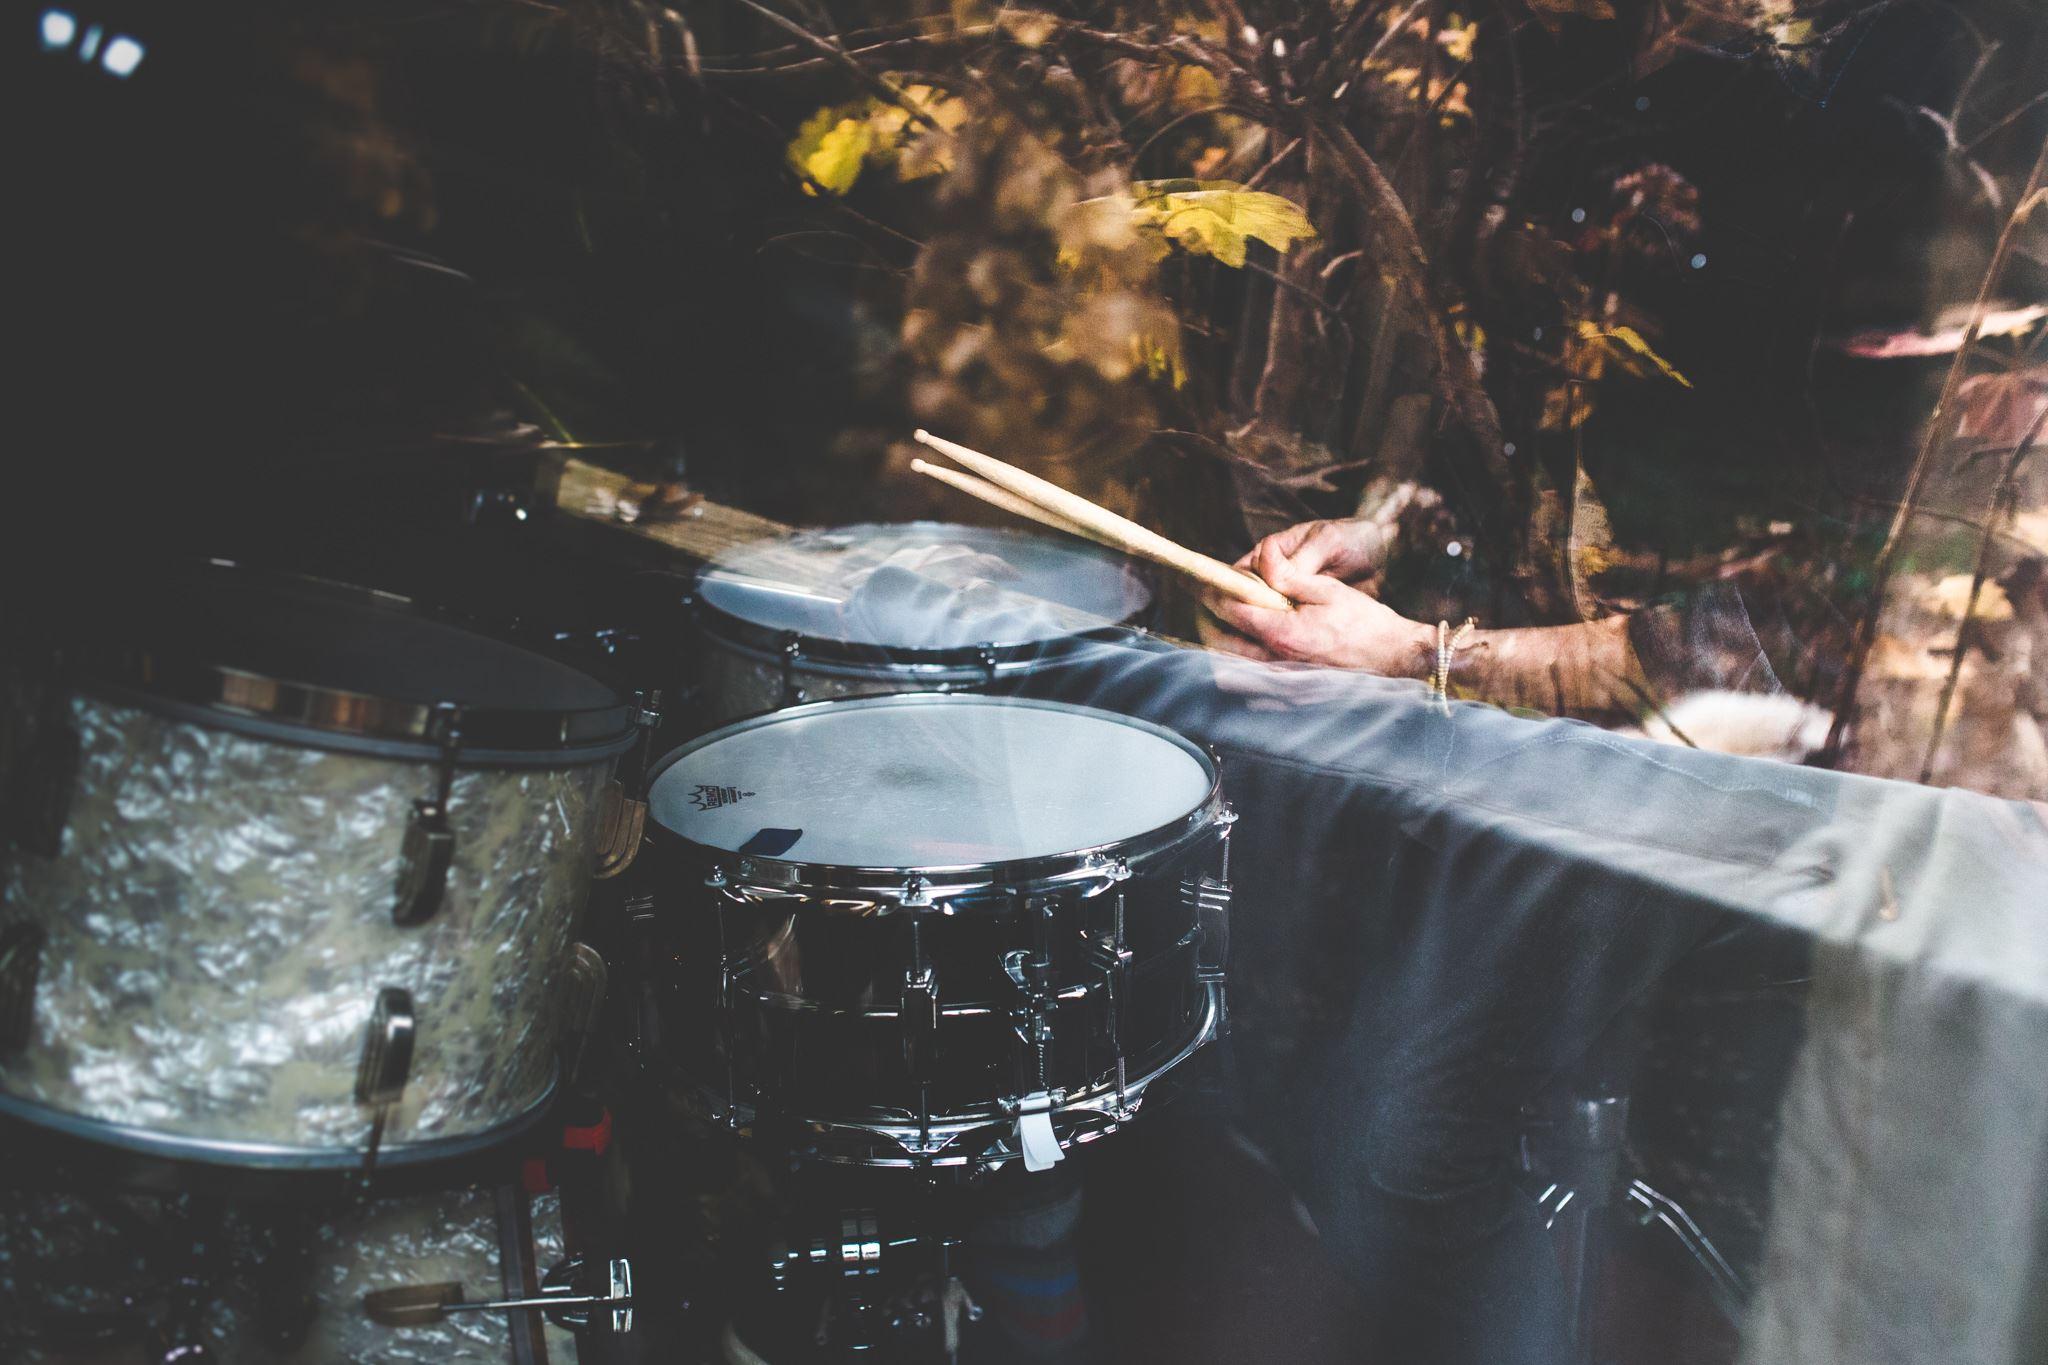 drums through the studio window